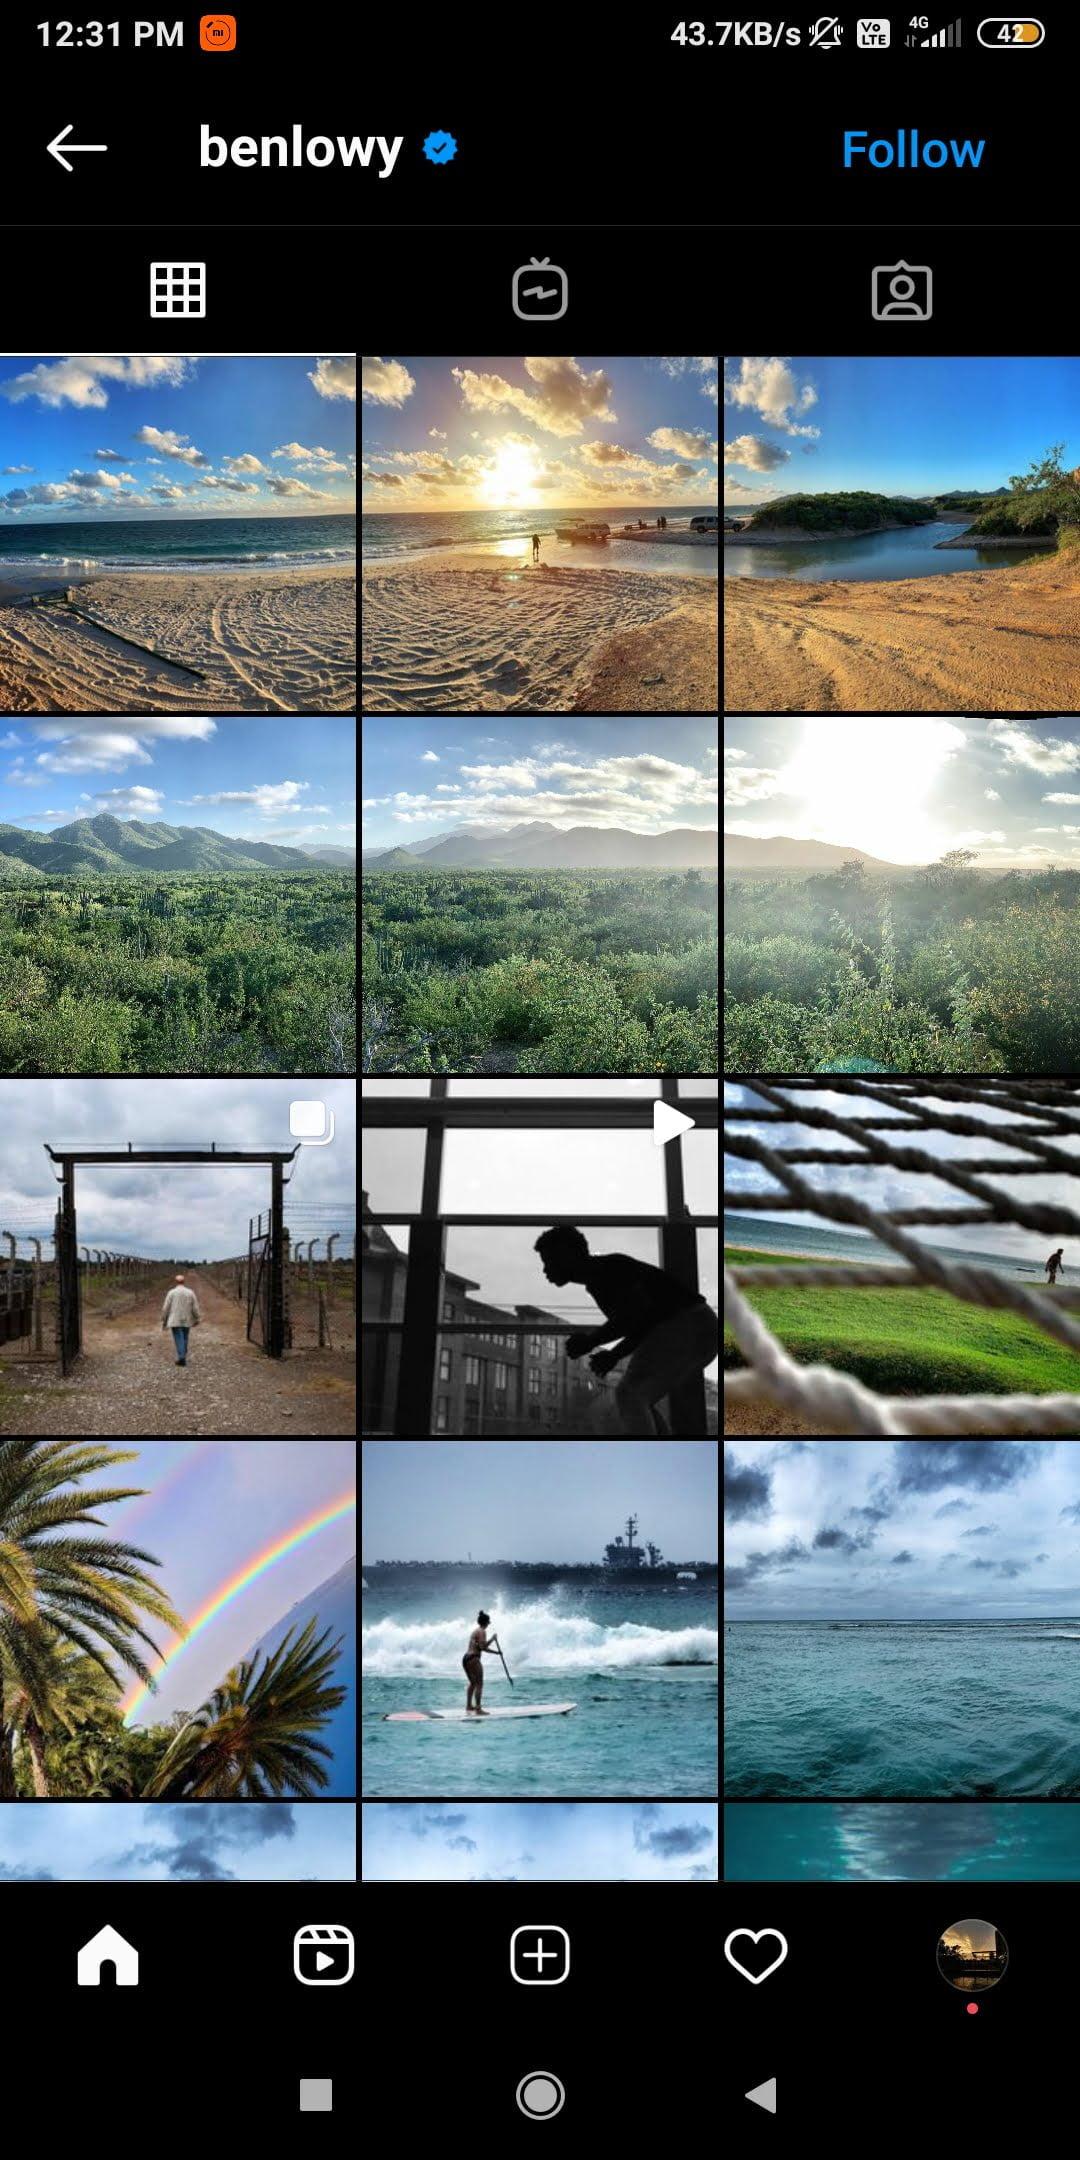 @benlowy  -  benlowy - 43 Best PHOTOGRAPHY Instagram Accounts  – PHOTOGRAPHERS to Follow Right Now